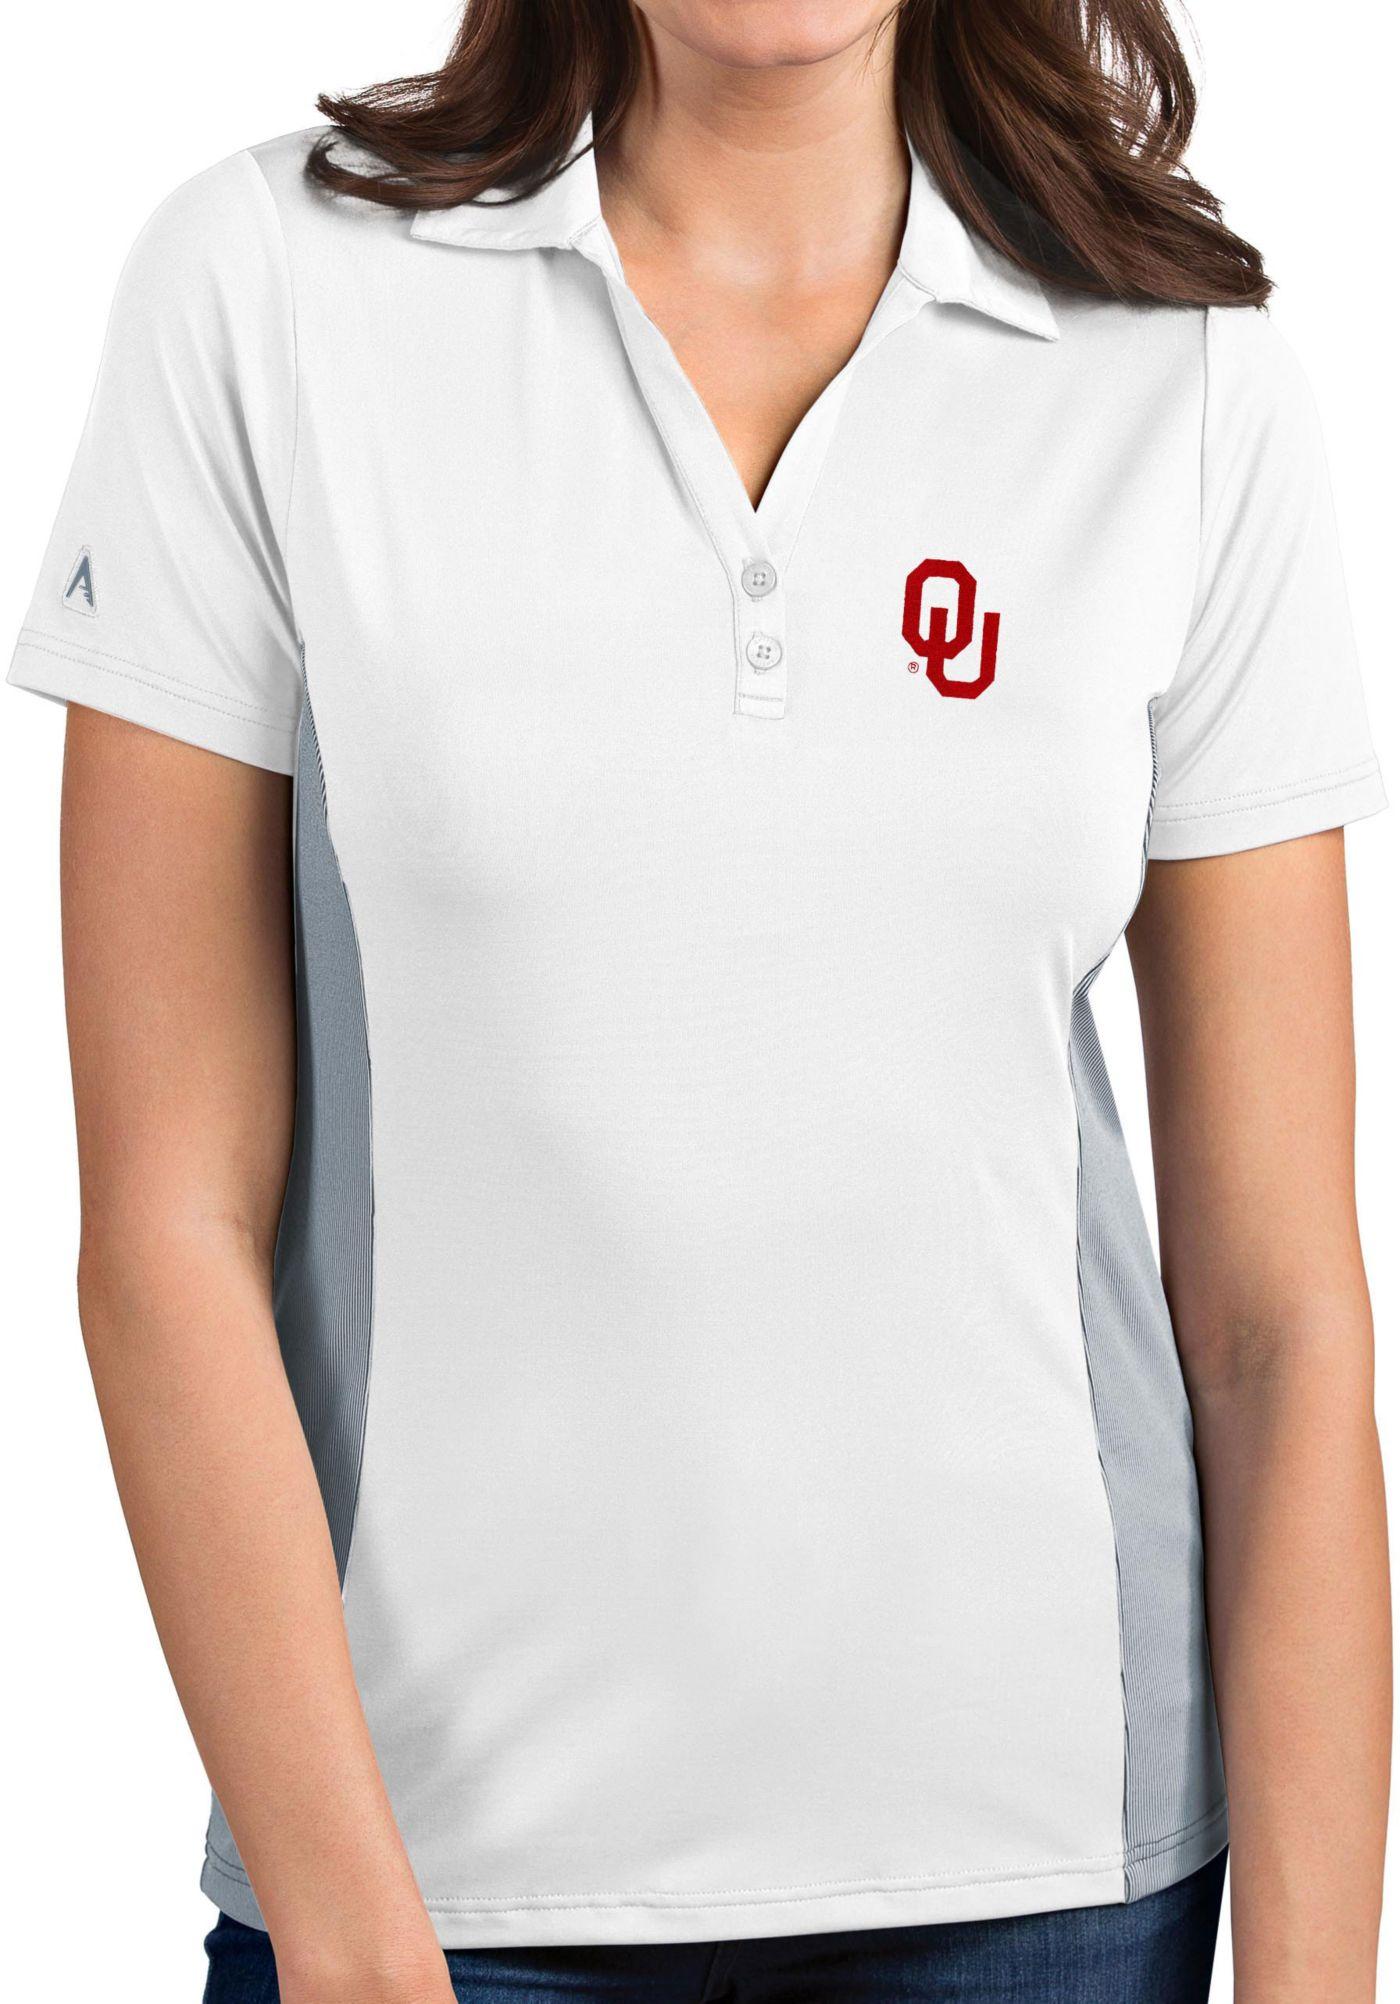 Antigua Women's Oklahoma Sooners Venture White Polo